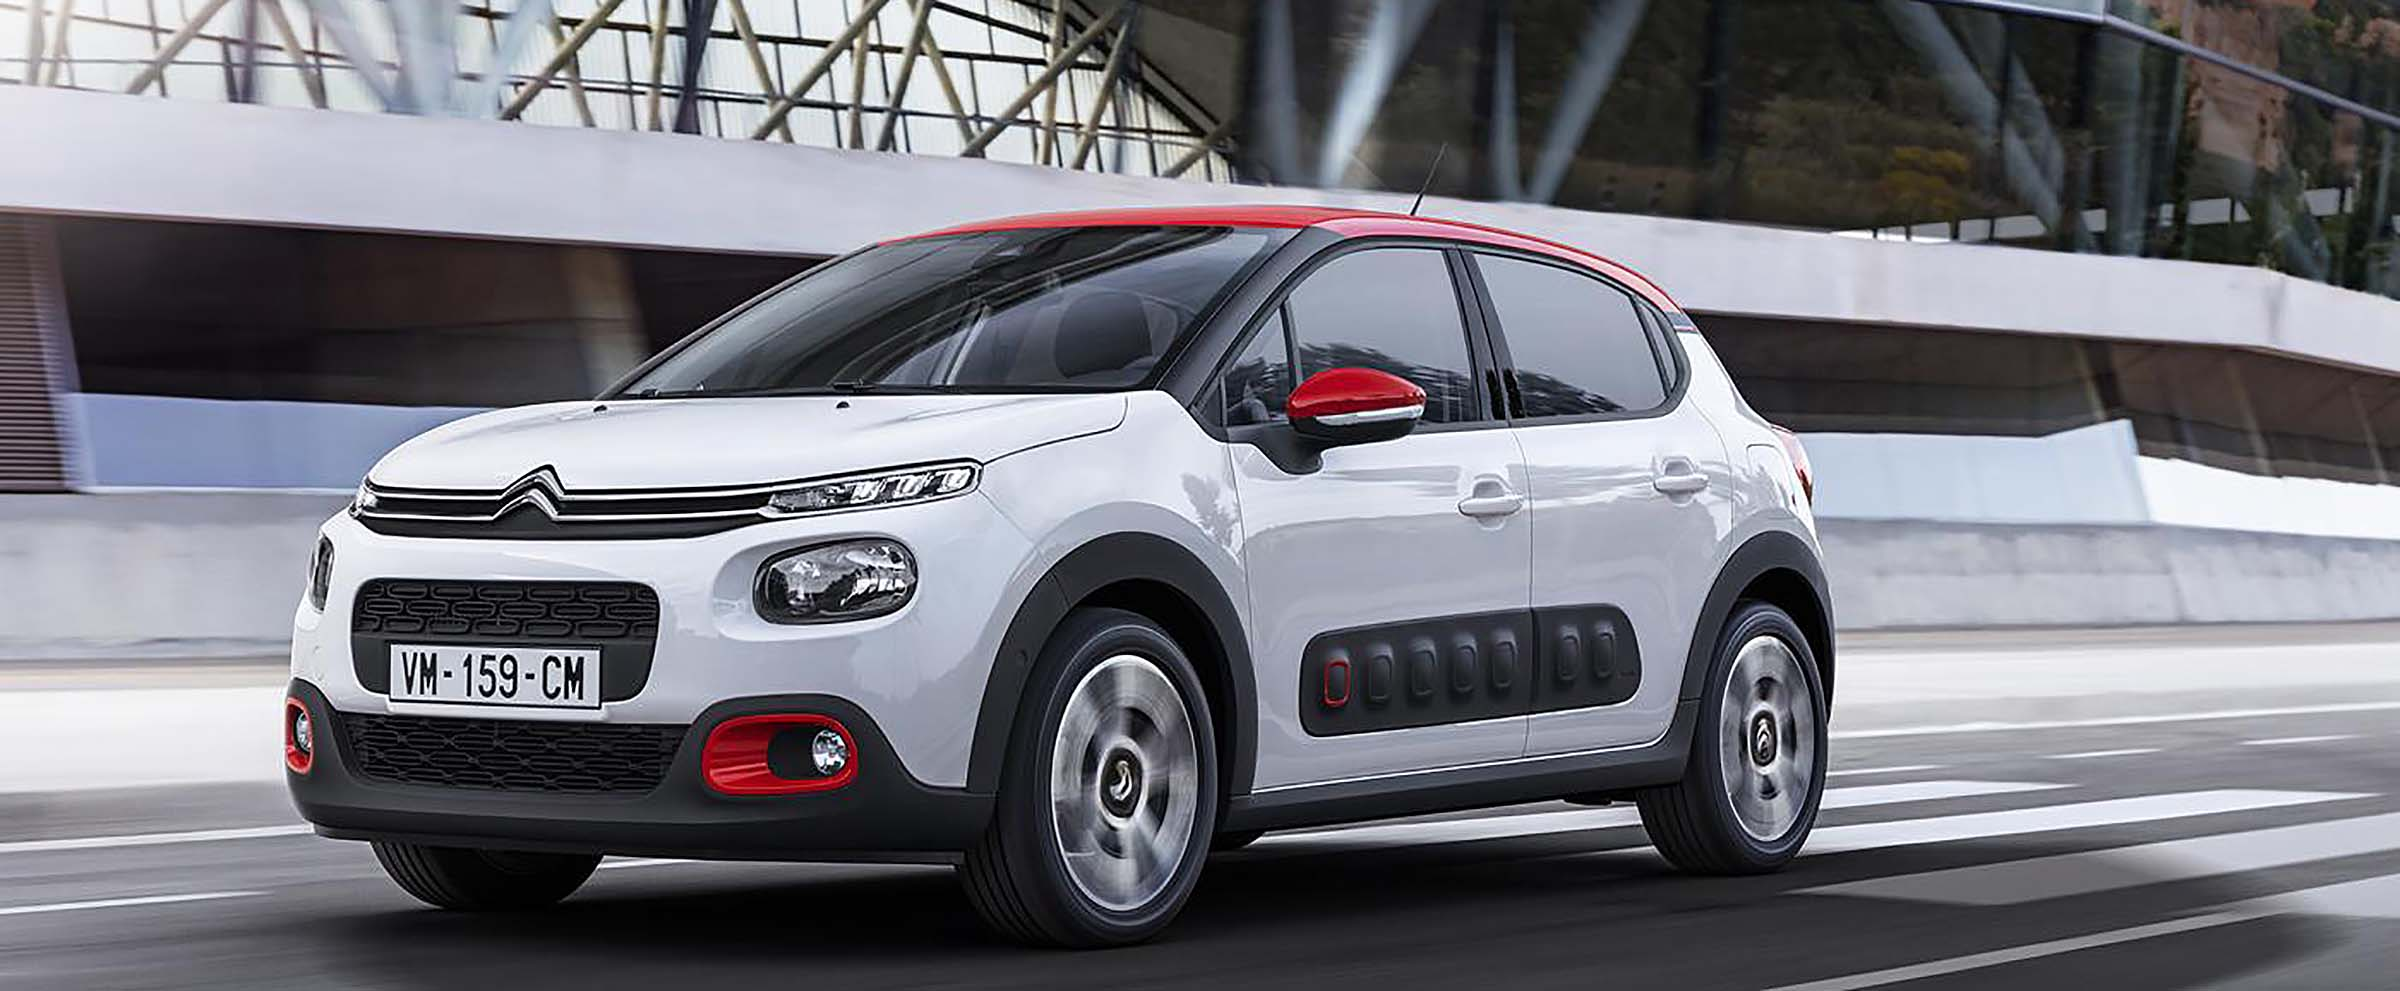 Citroën Garage Galliker Carplanet Angebote